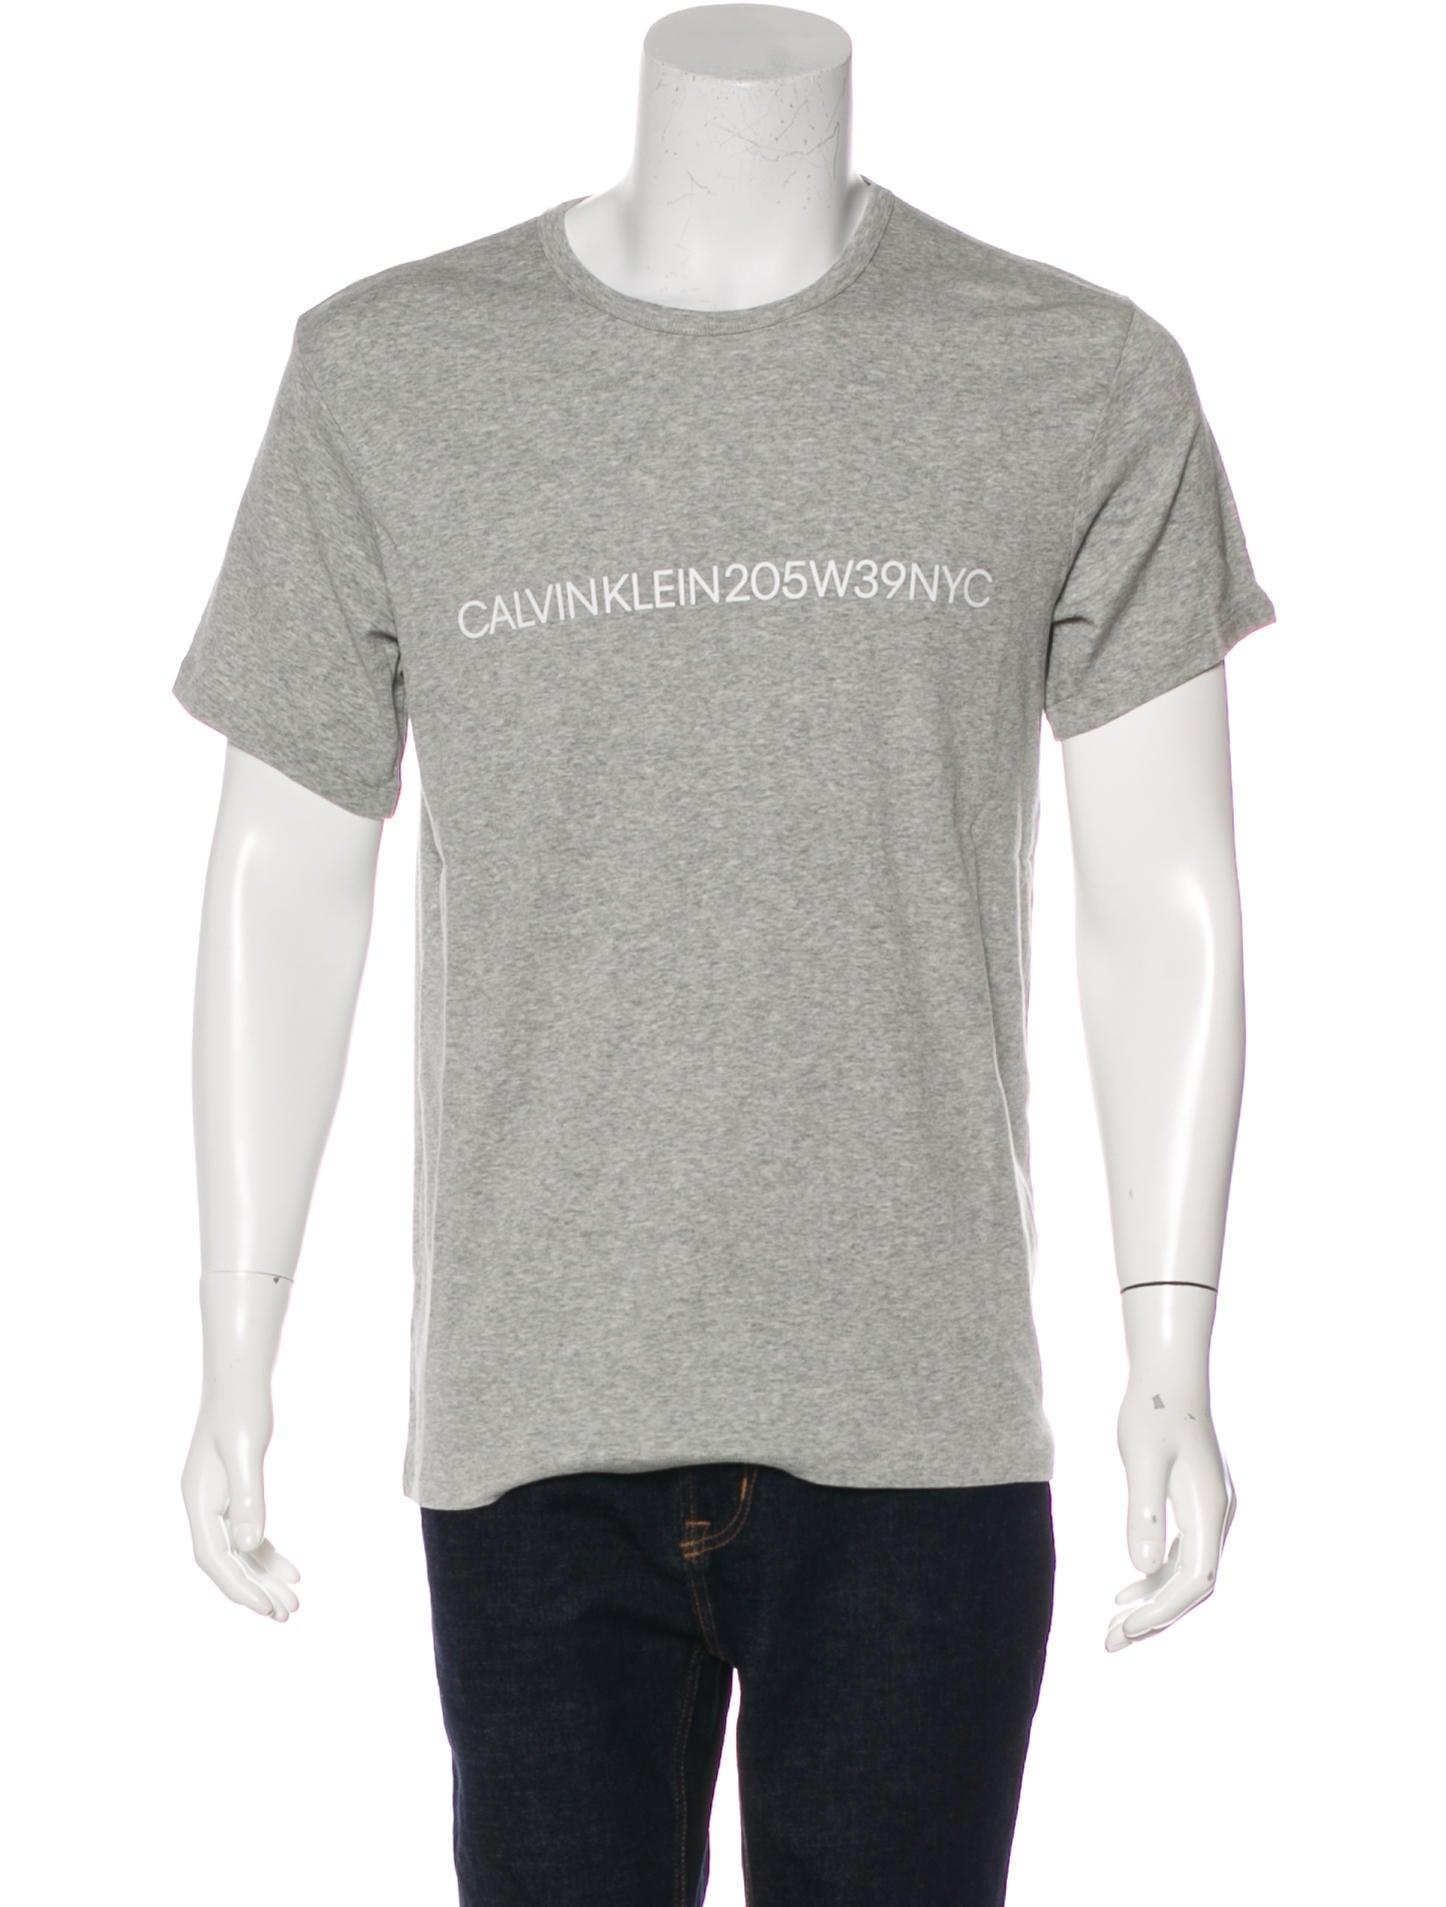 eadb26a65de3 Calvin Klein 205W39NYC Logo Print T-Shirt w/ Tags - Clothing ...